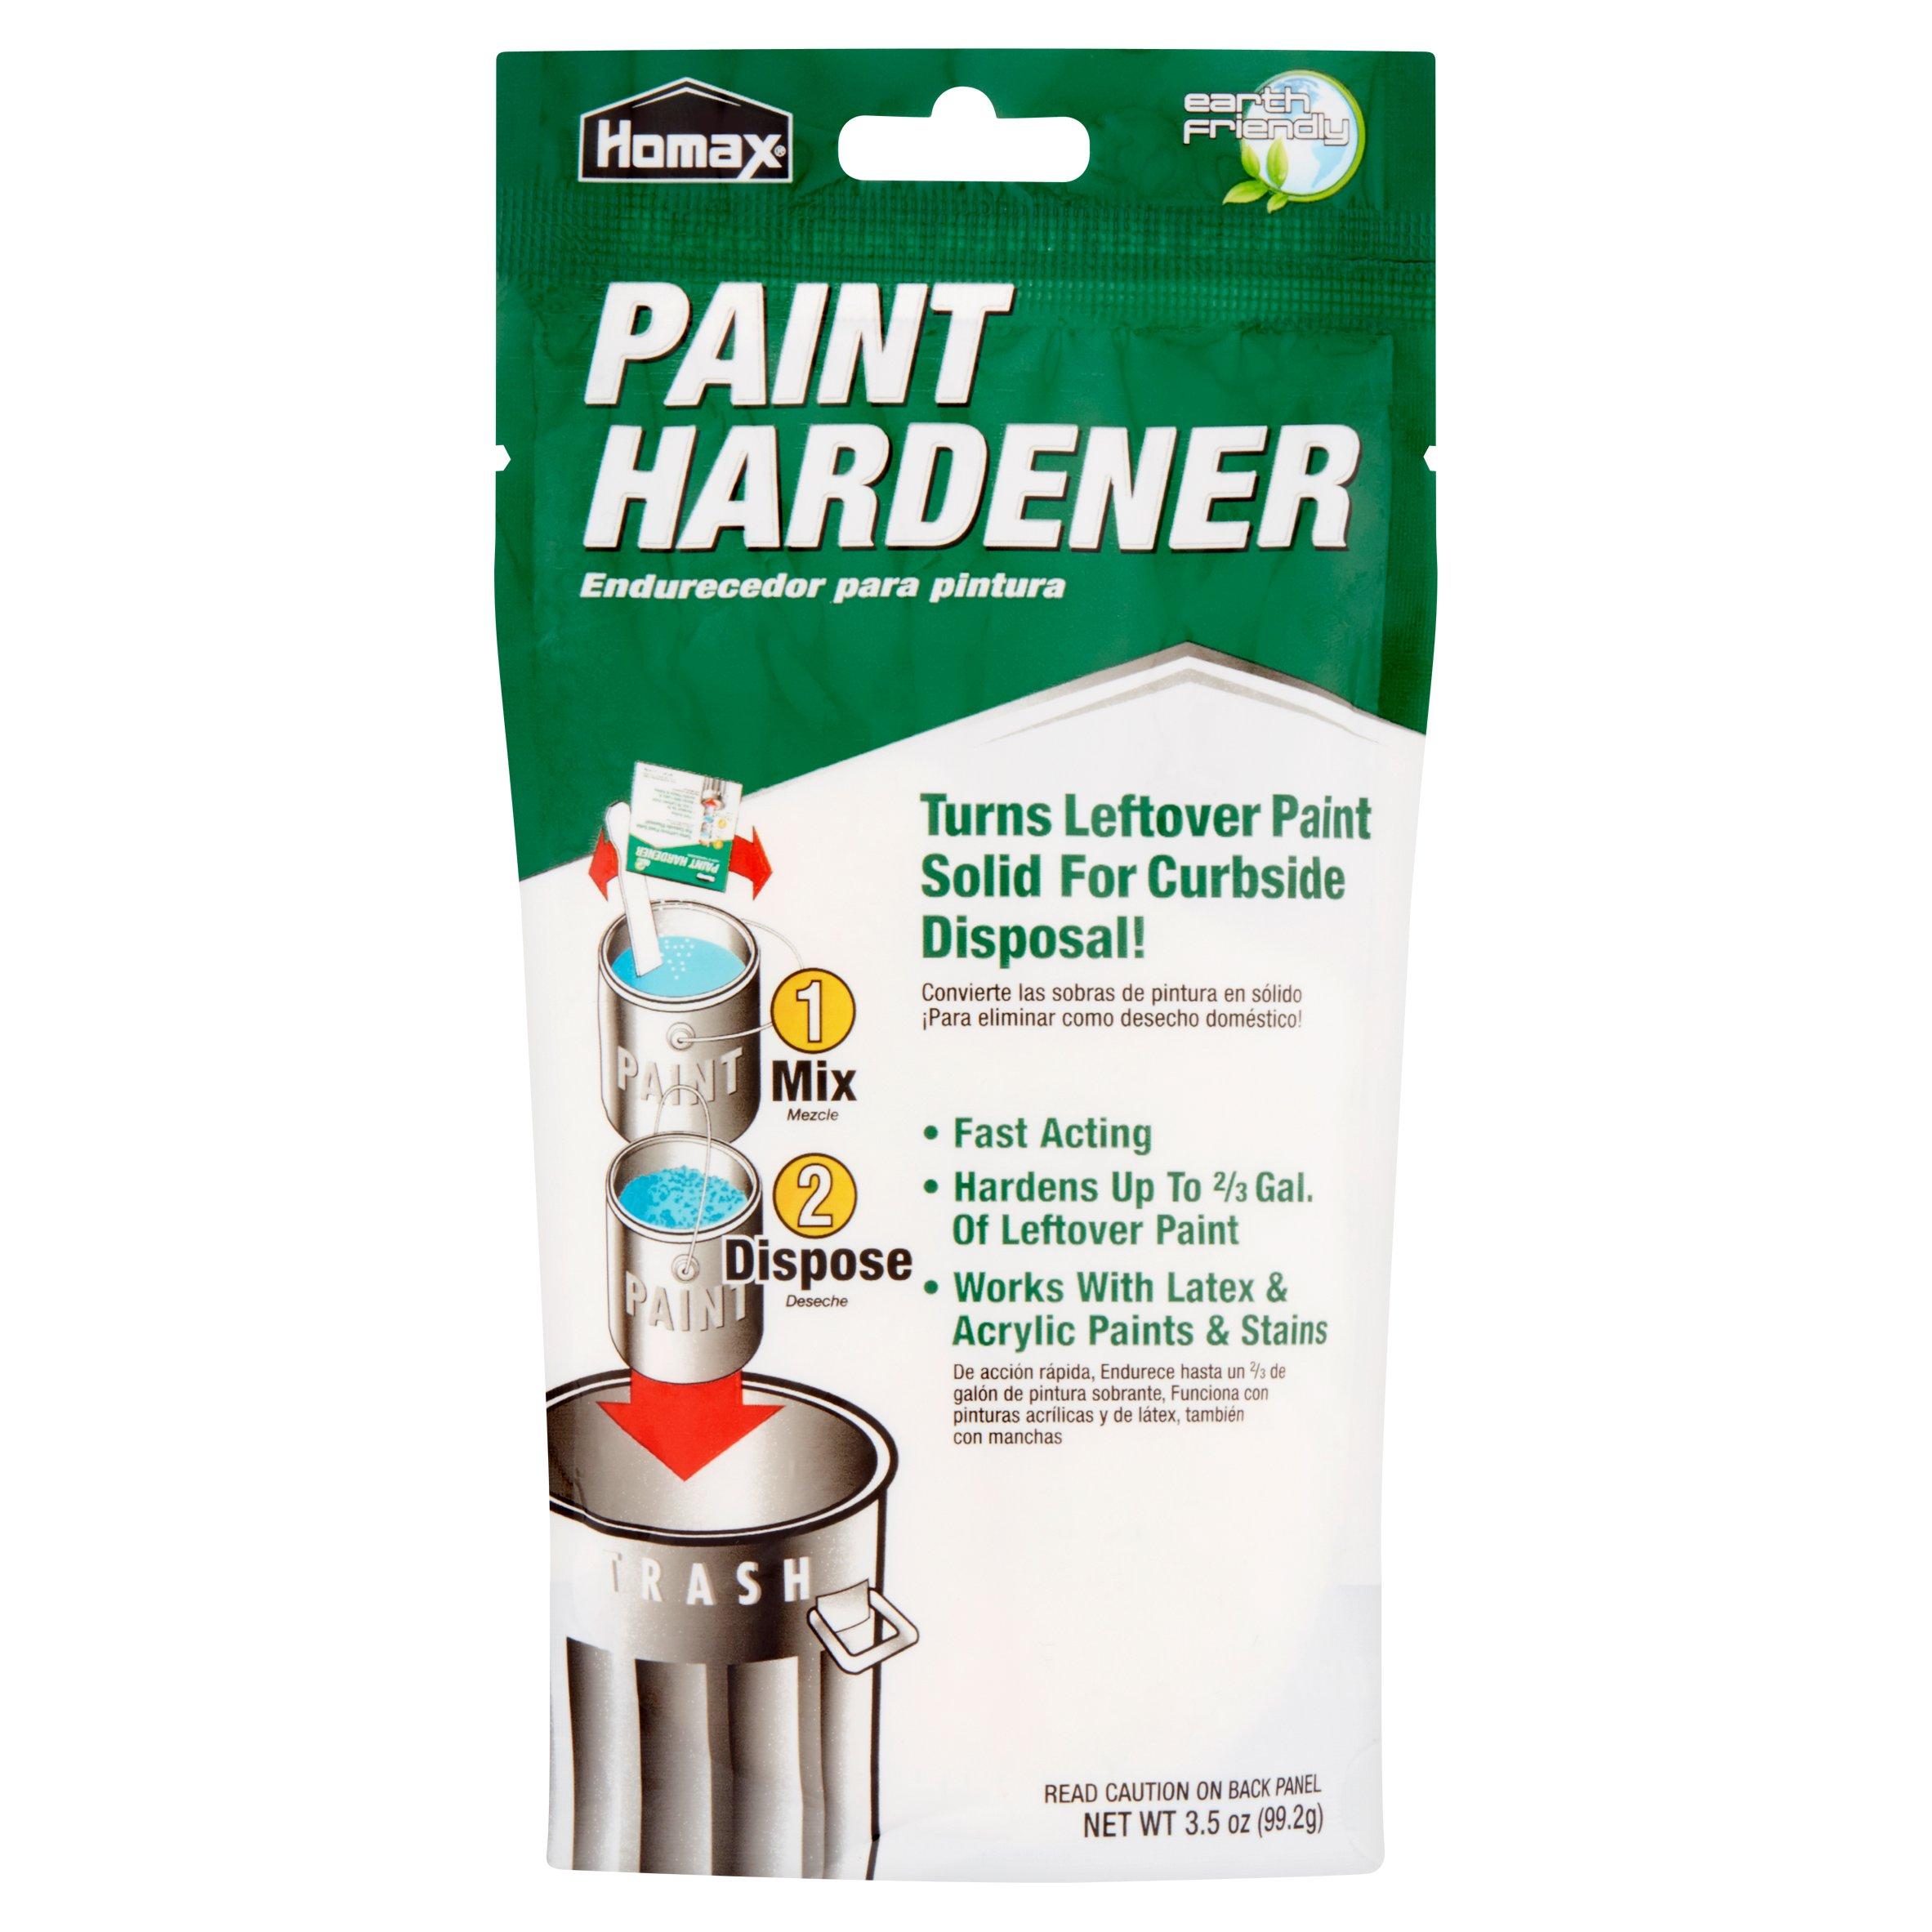 Homax Paint Hardener, 3.5 oz